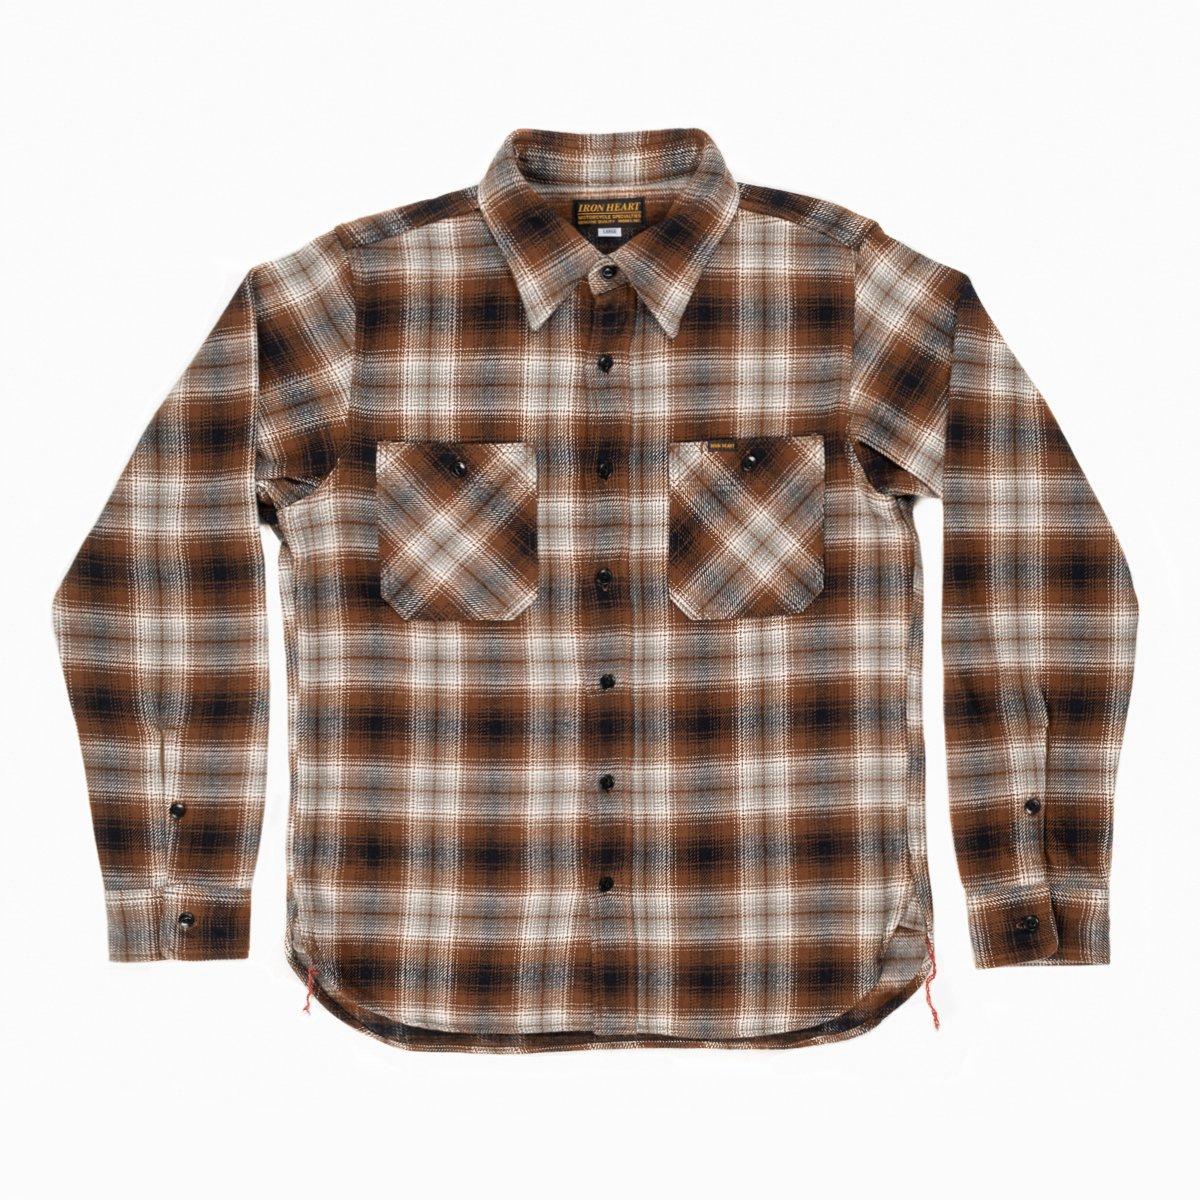 b14ca5485cb Brown Ultra Heavy Flannel Classic Check Work Shirt